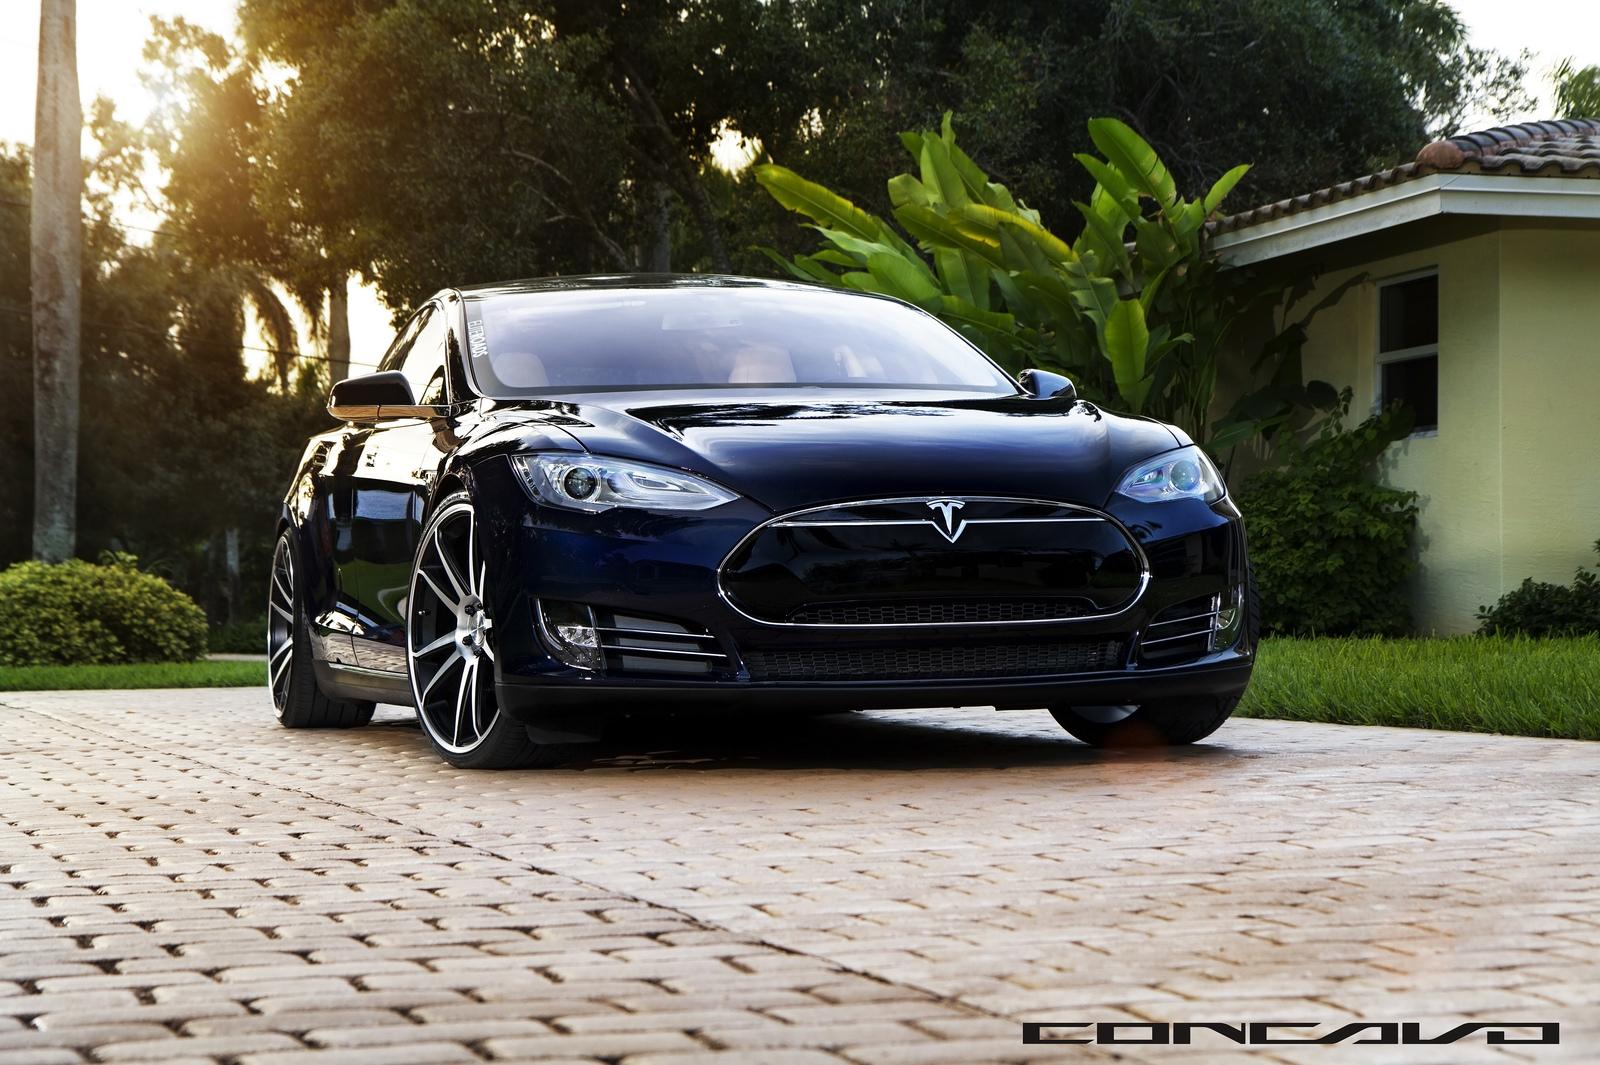 Tesla-Model-S-Concavo-22inch-Wheels-Front